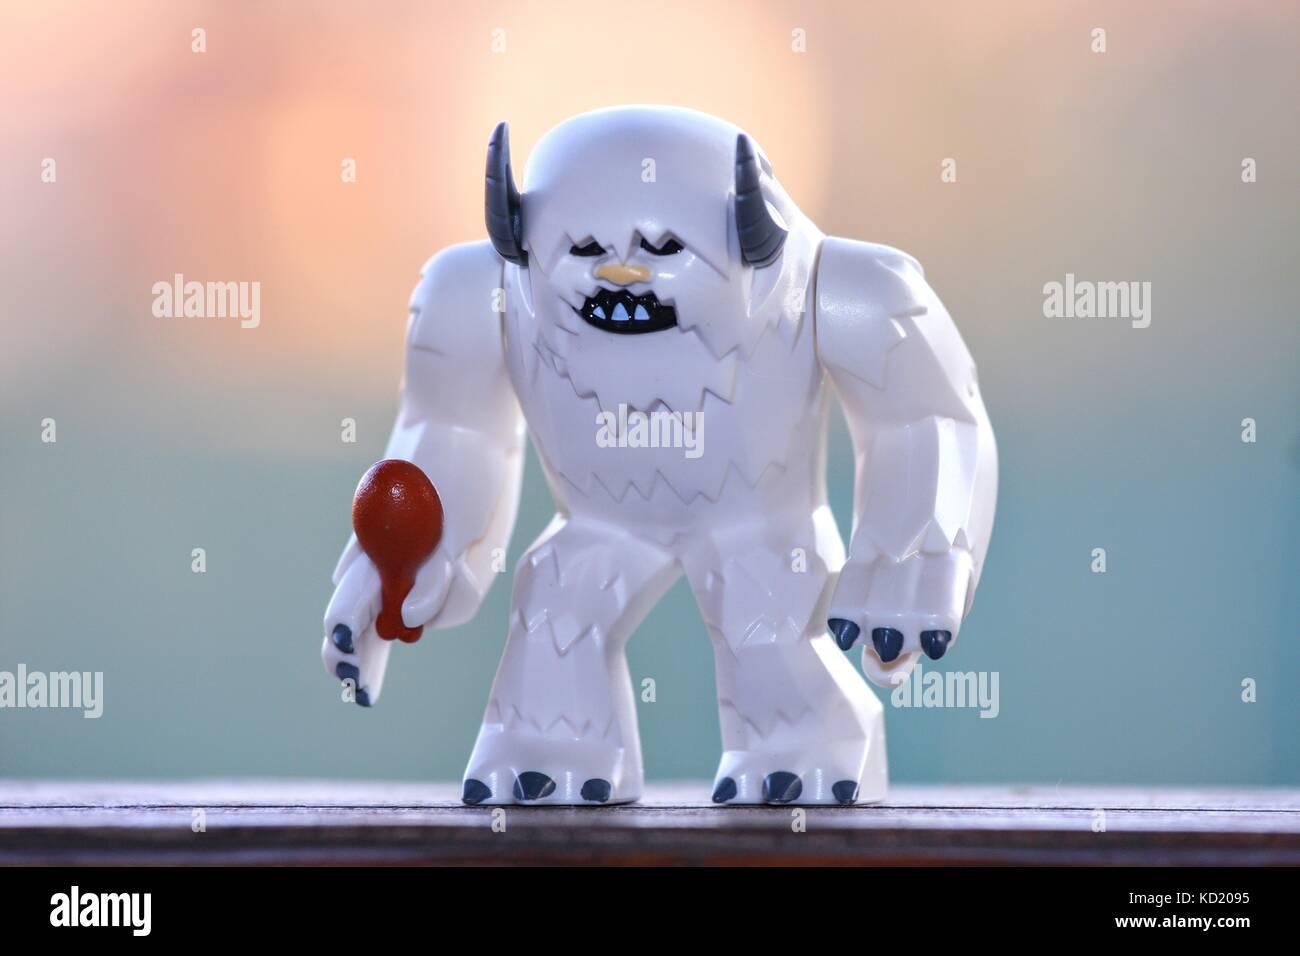 wampa lego starwars minifigure